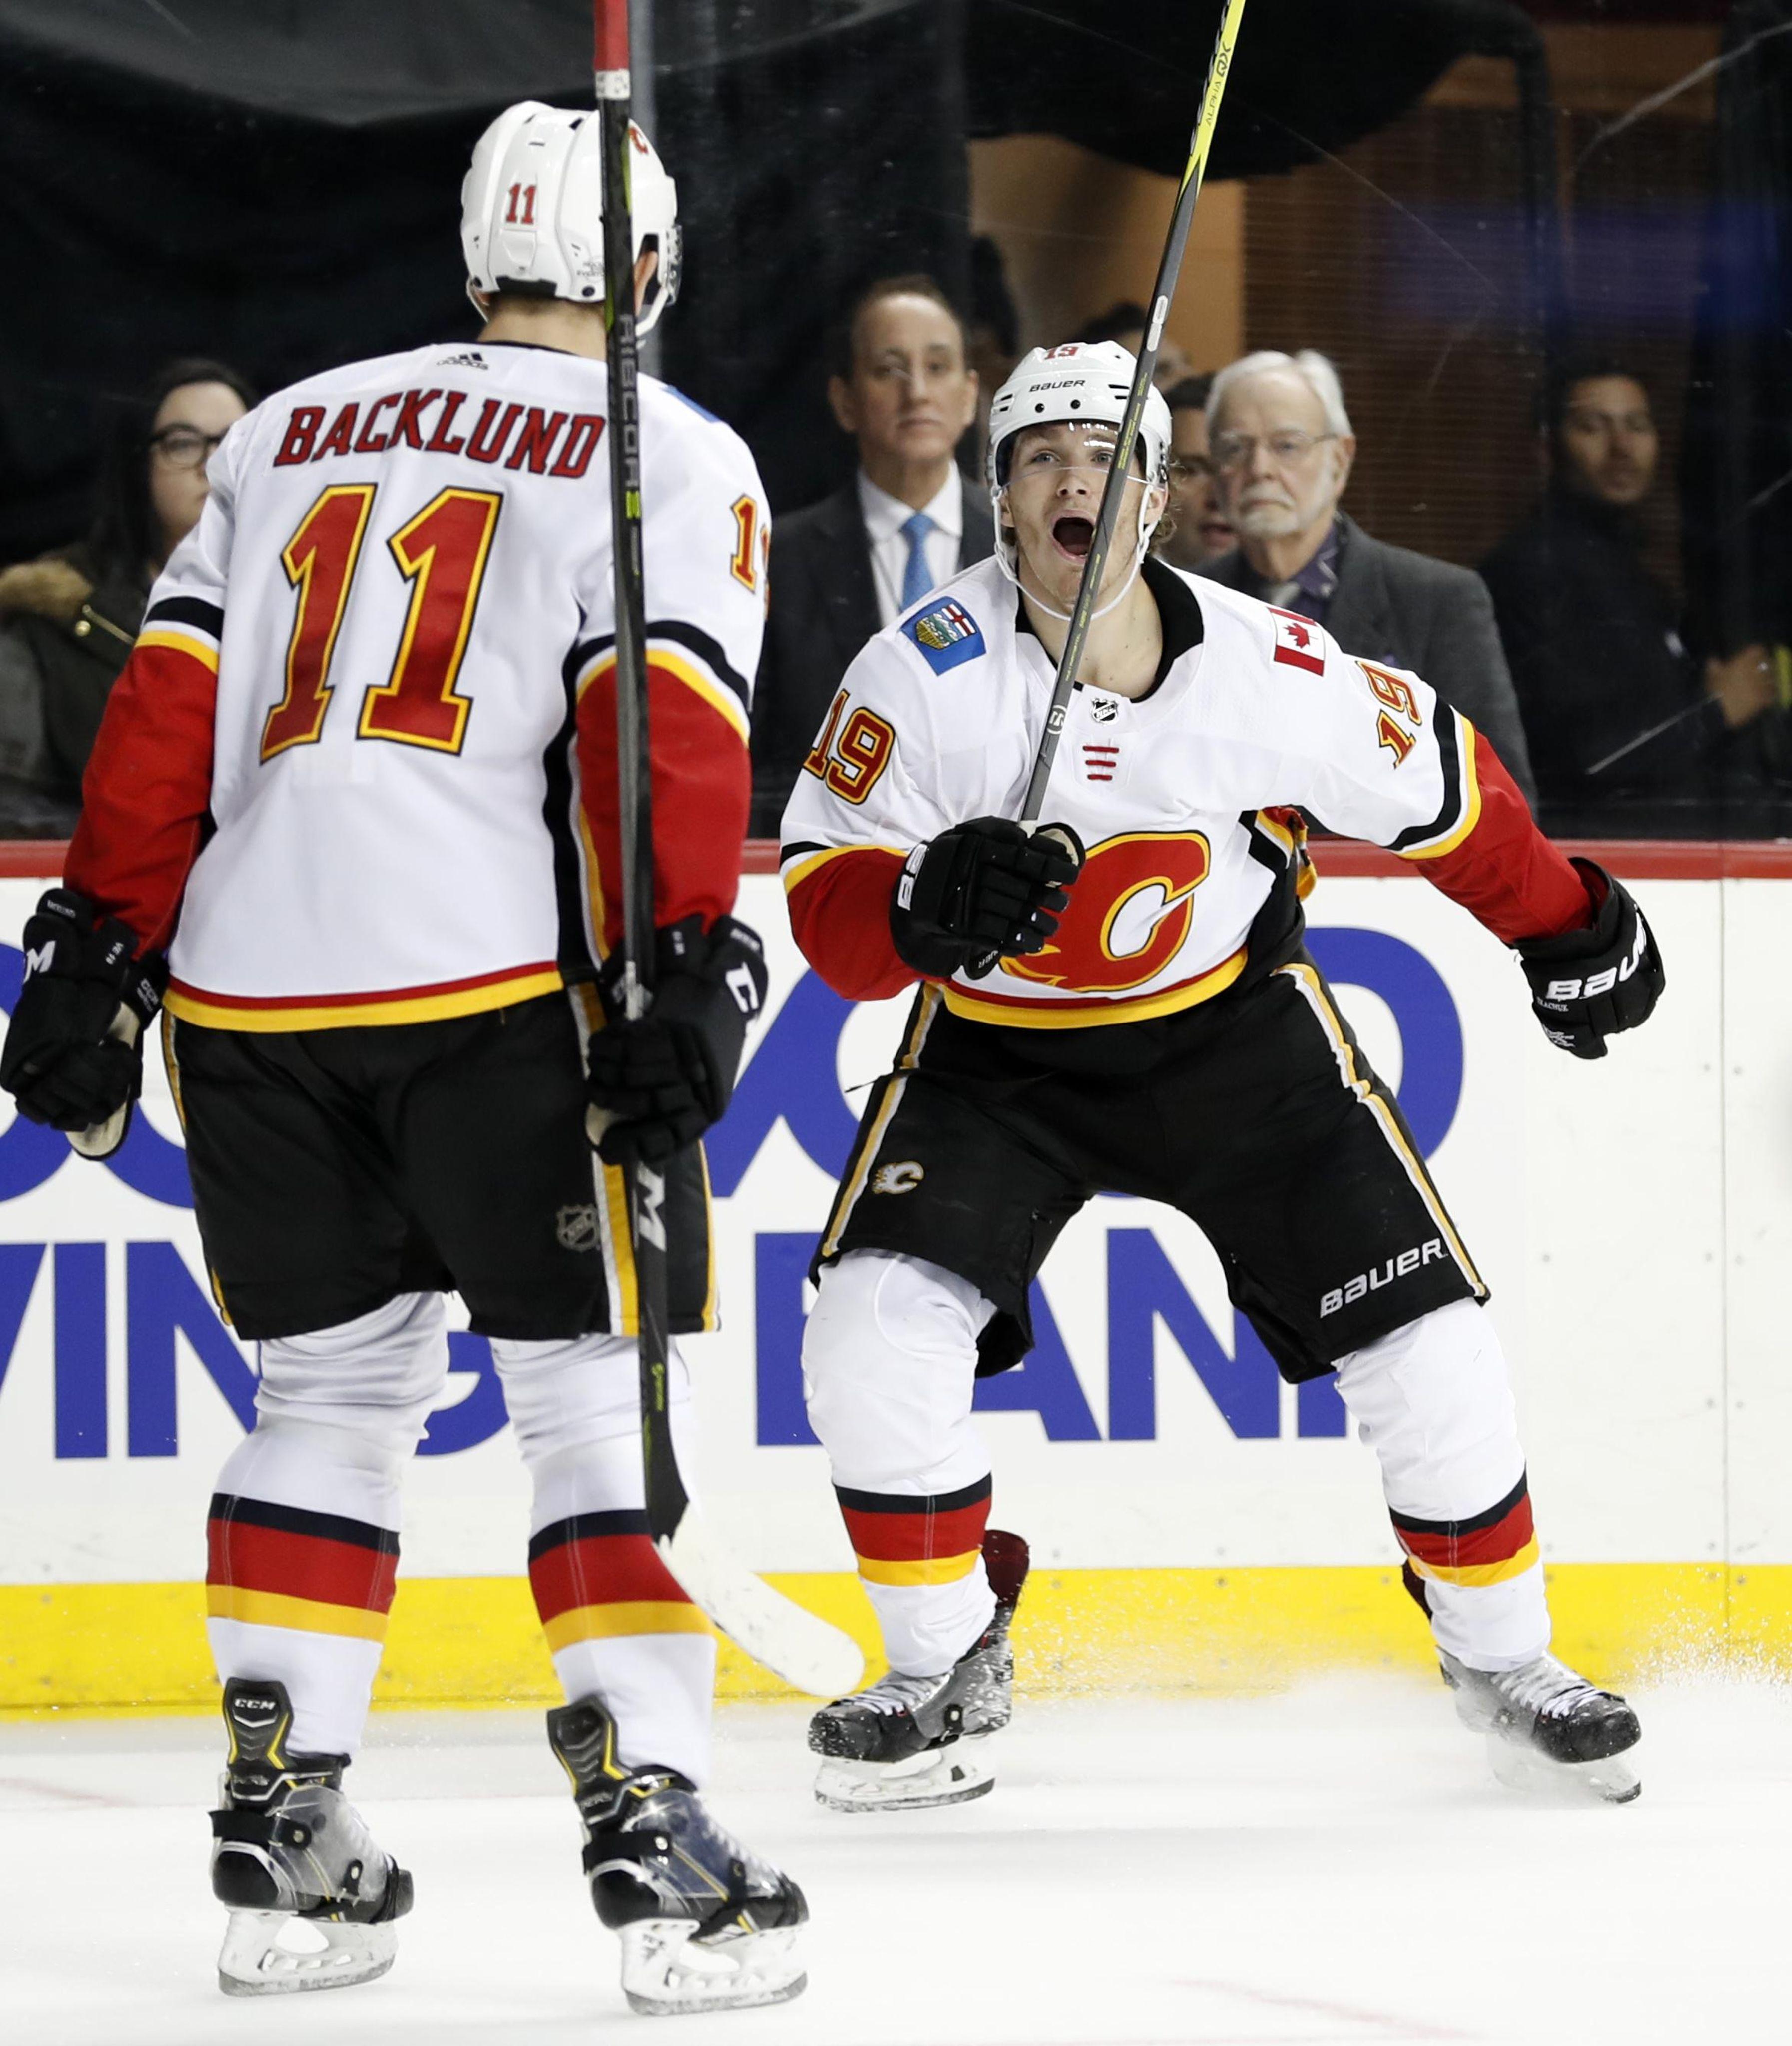 Flames_islanders_hockey_30672_s3588x4096